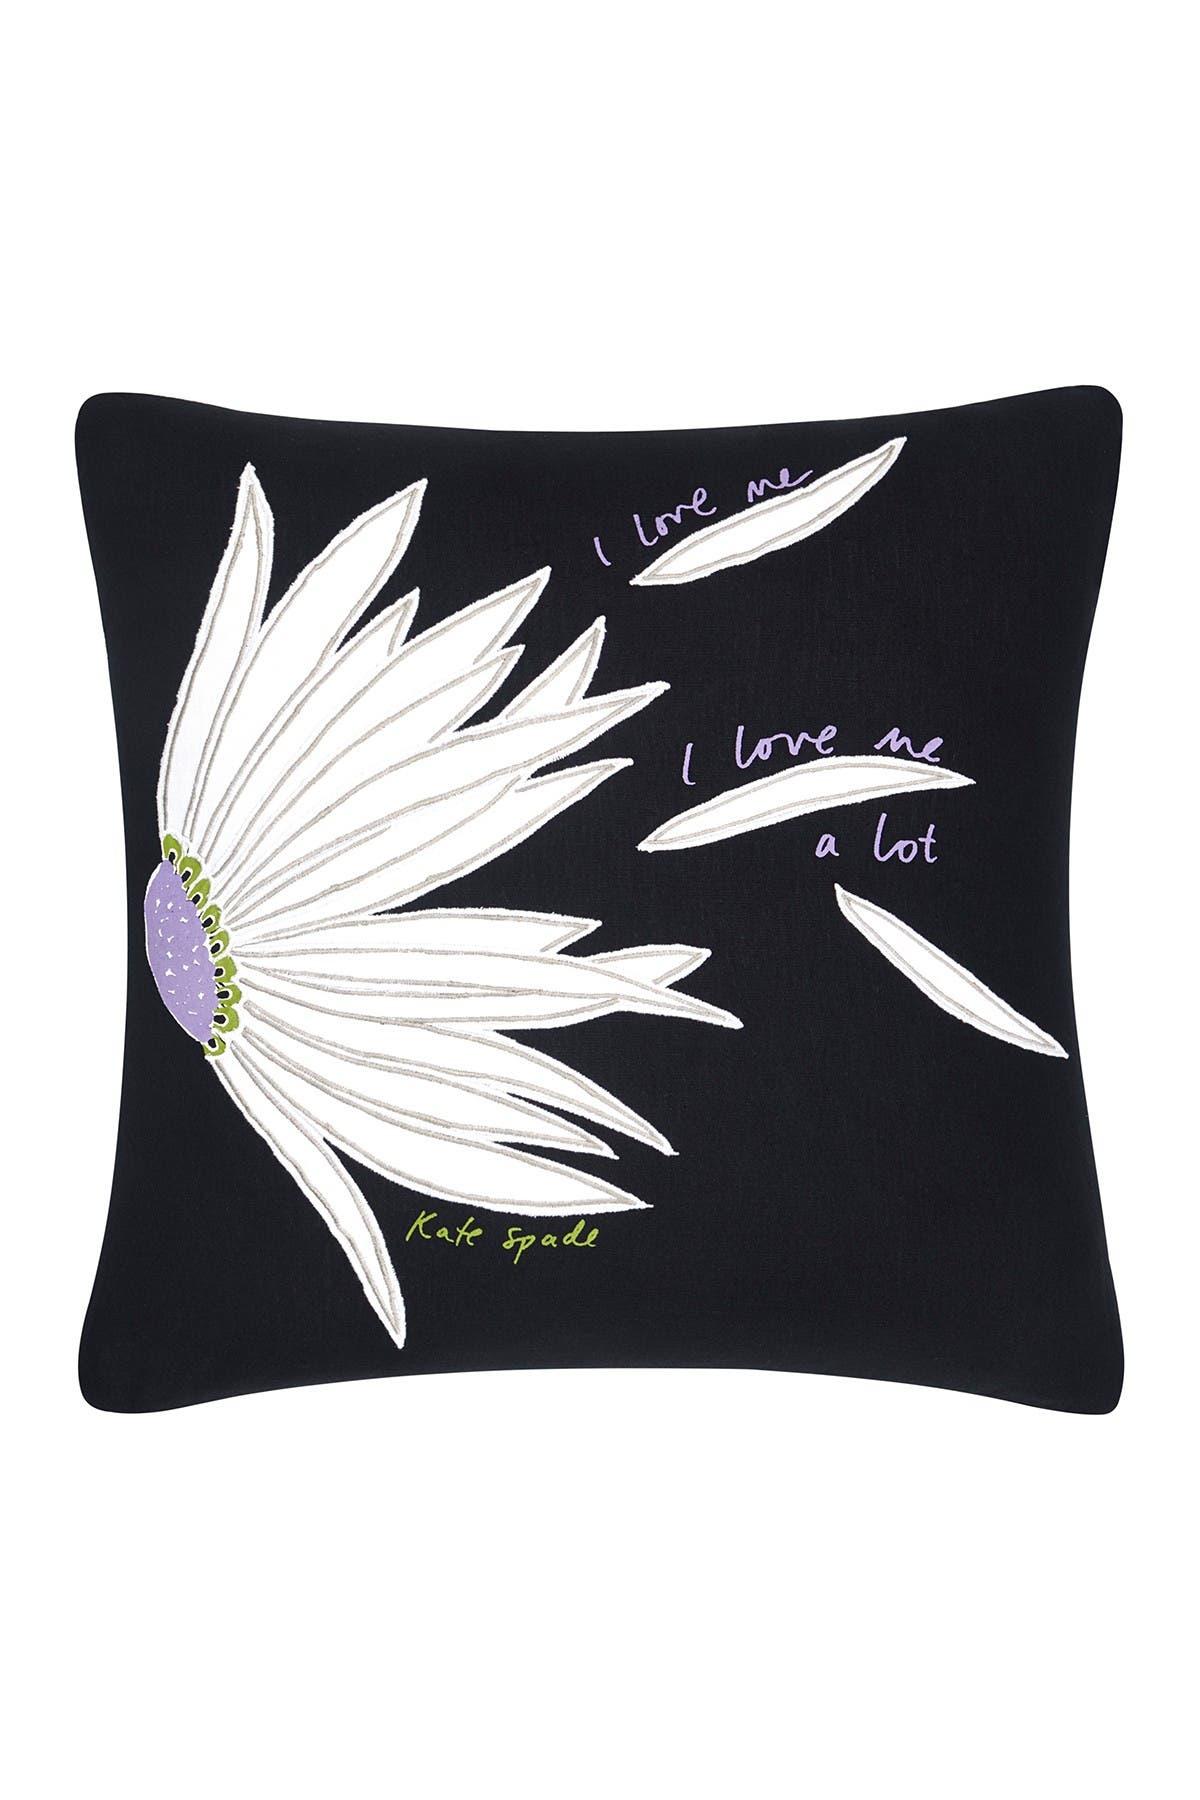 "Image of kate spade new york falling flowers decorative pillow 18""x18"" - black"